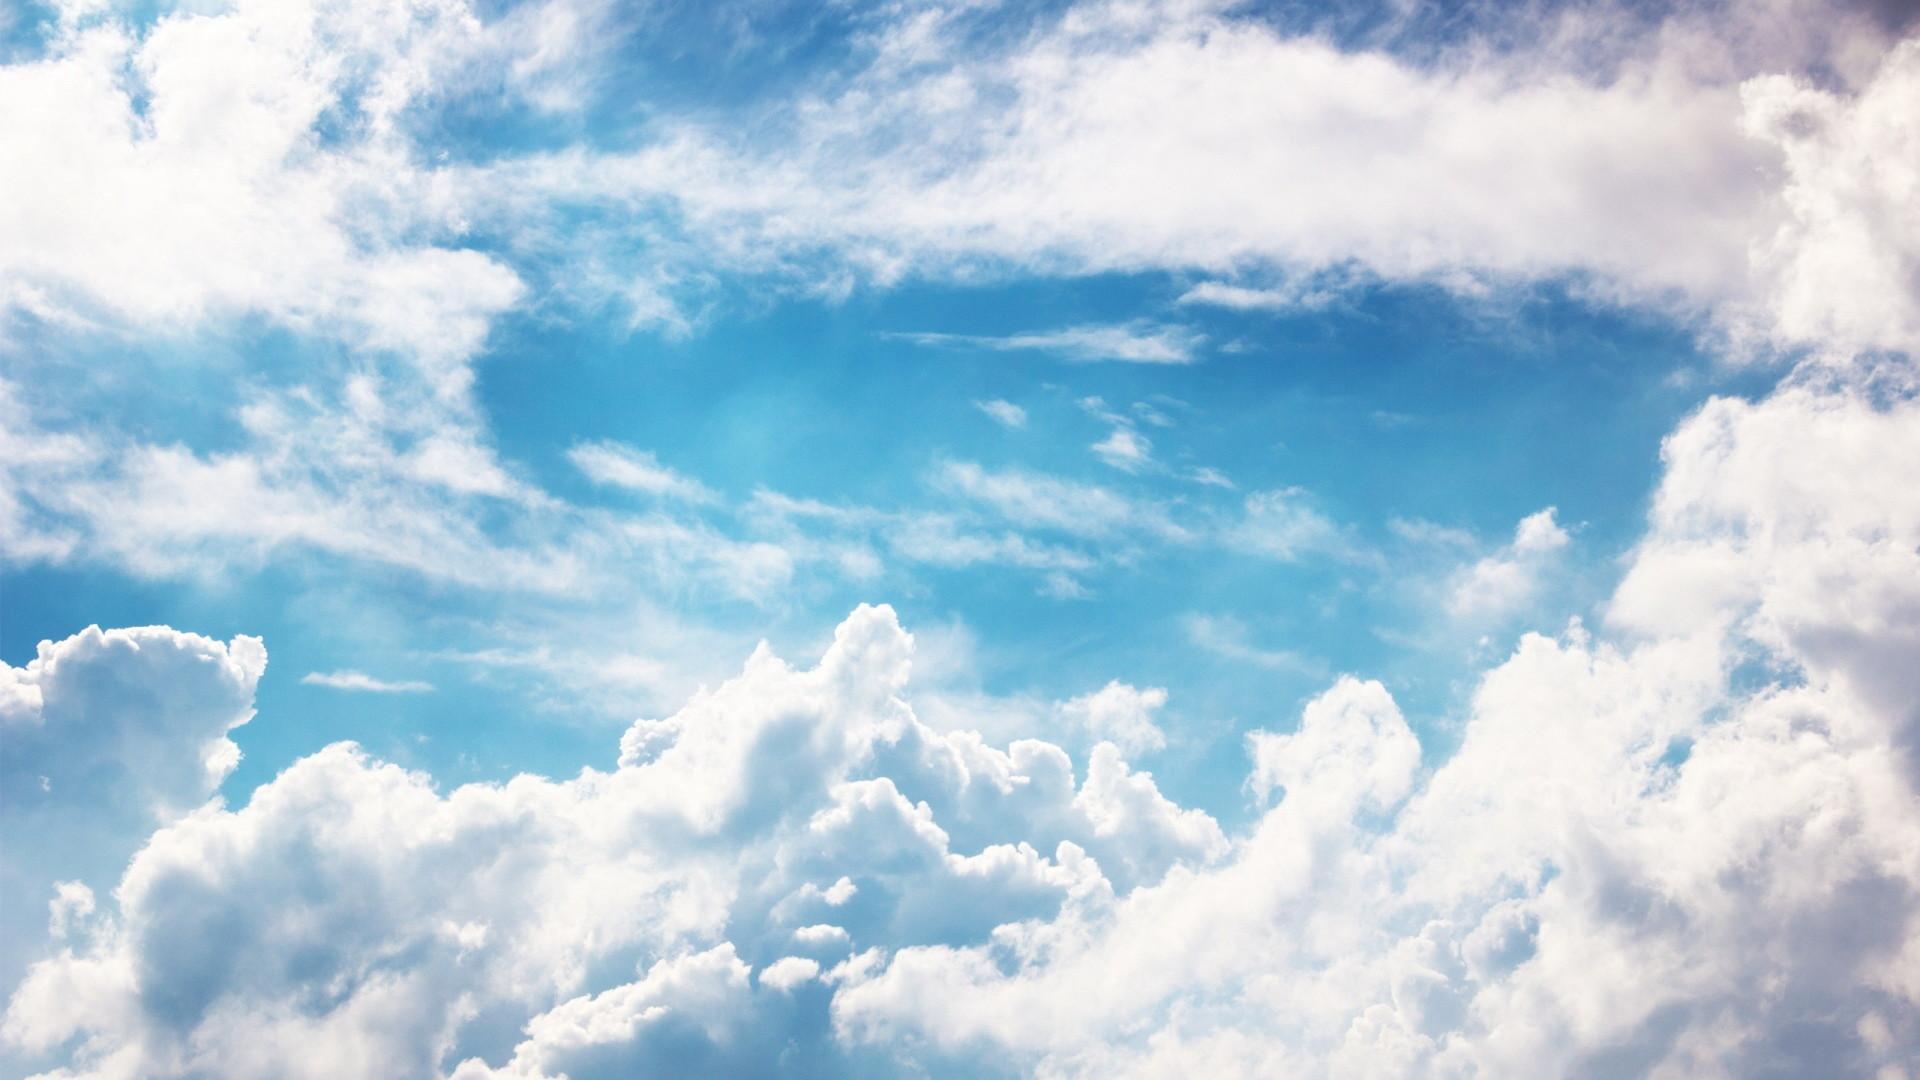 Clouds · Clouds Wallpaper 7938